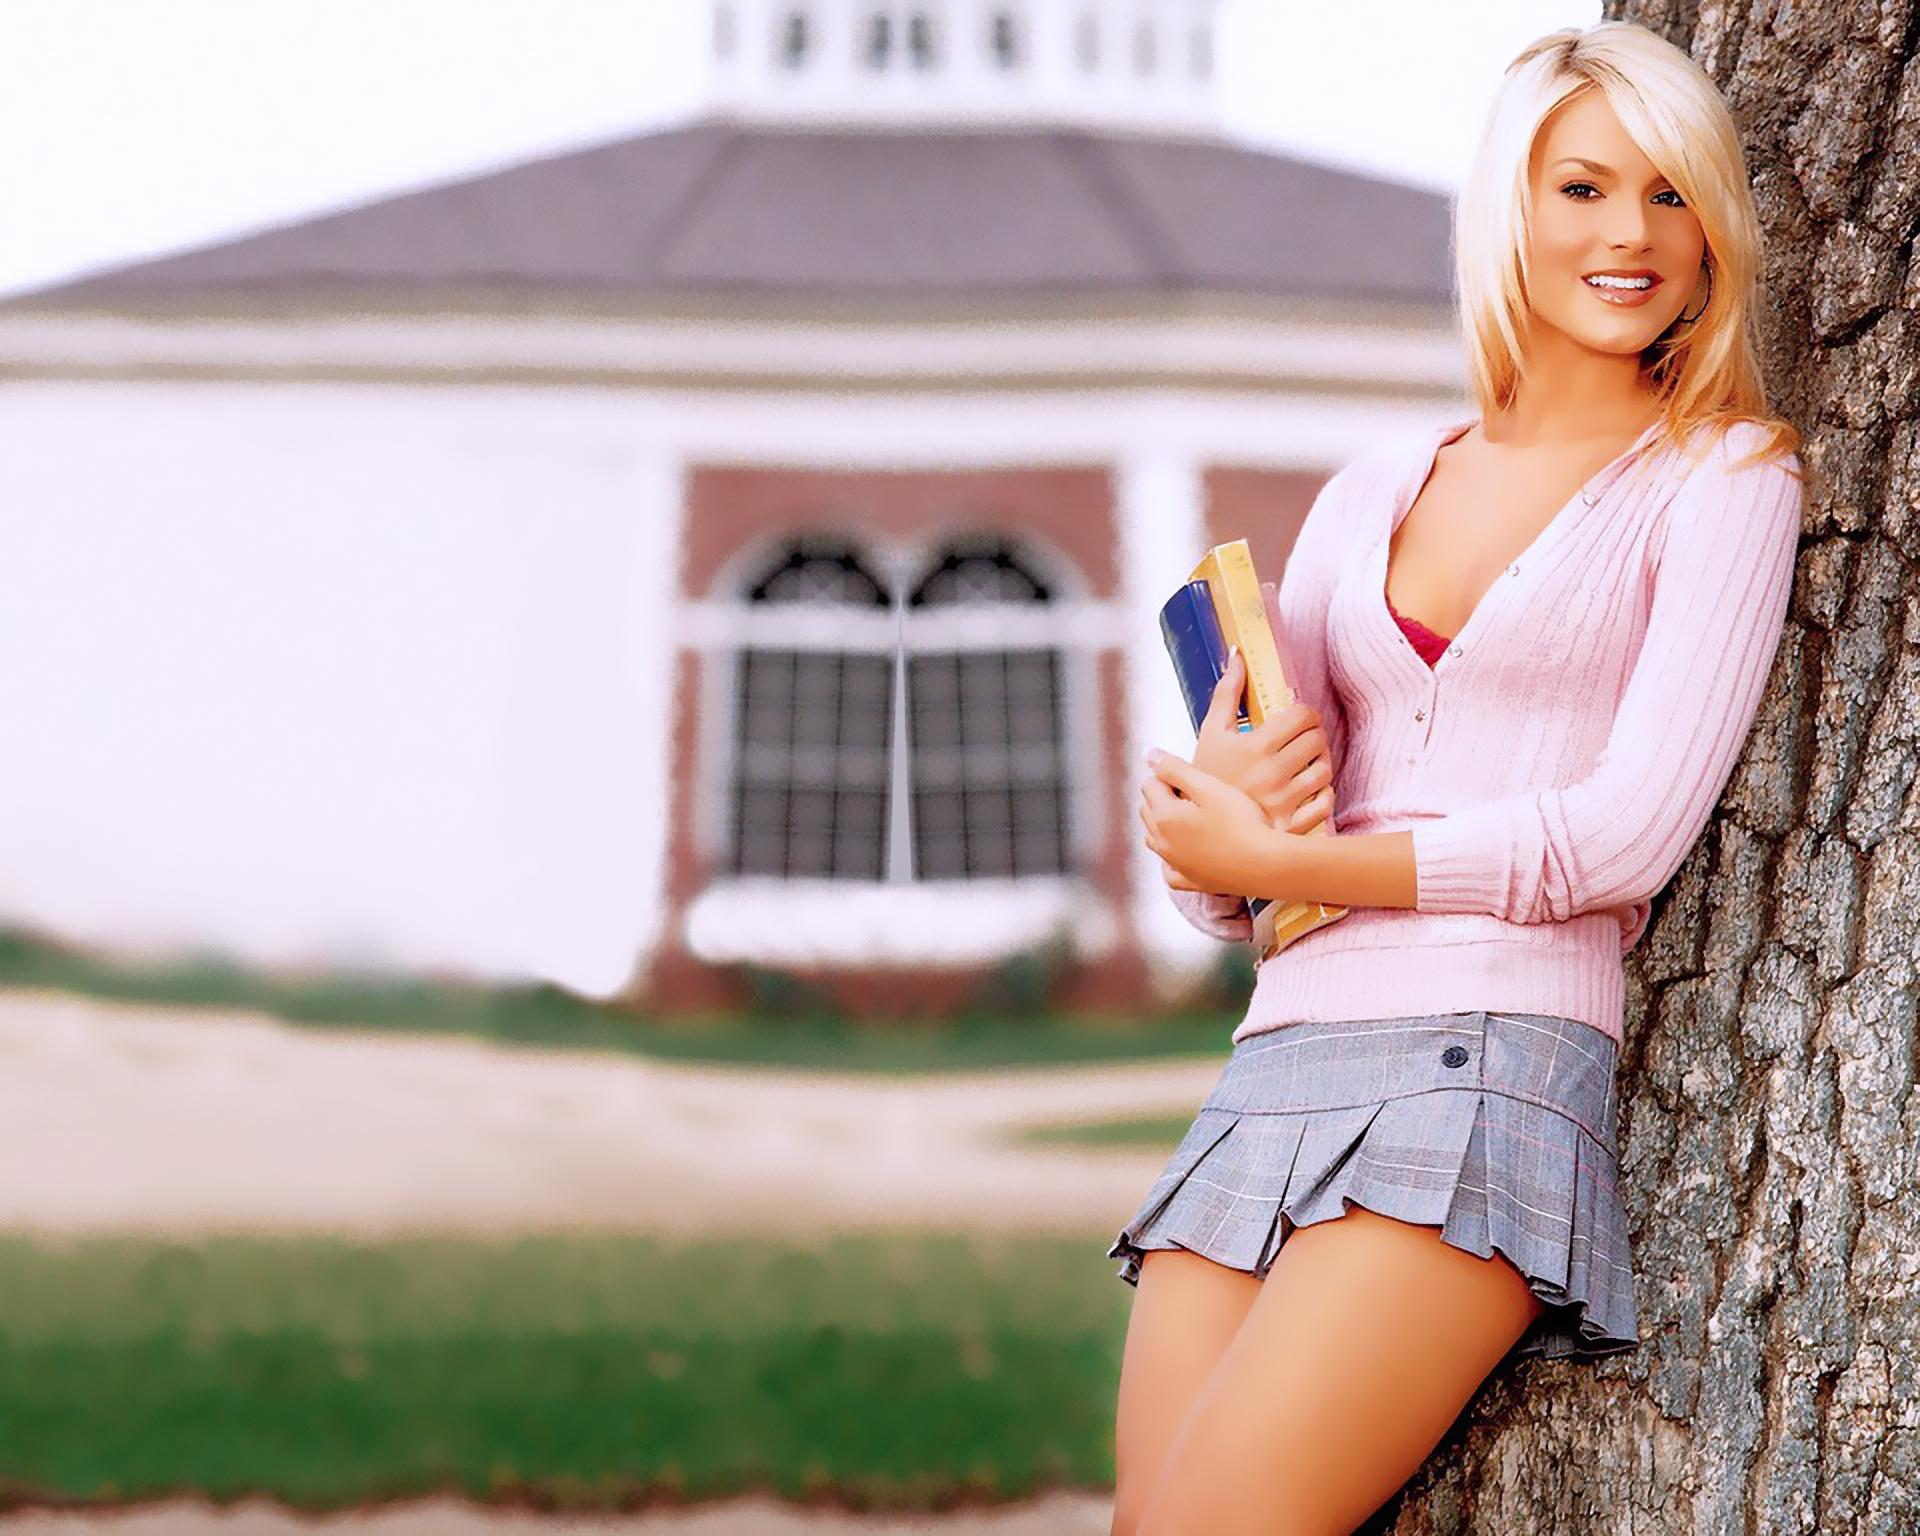 Teen girls in micro short pics